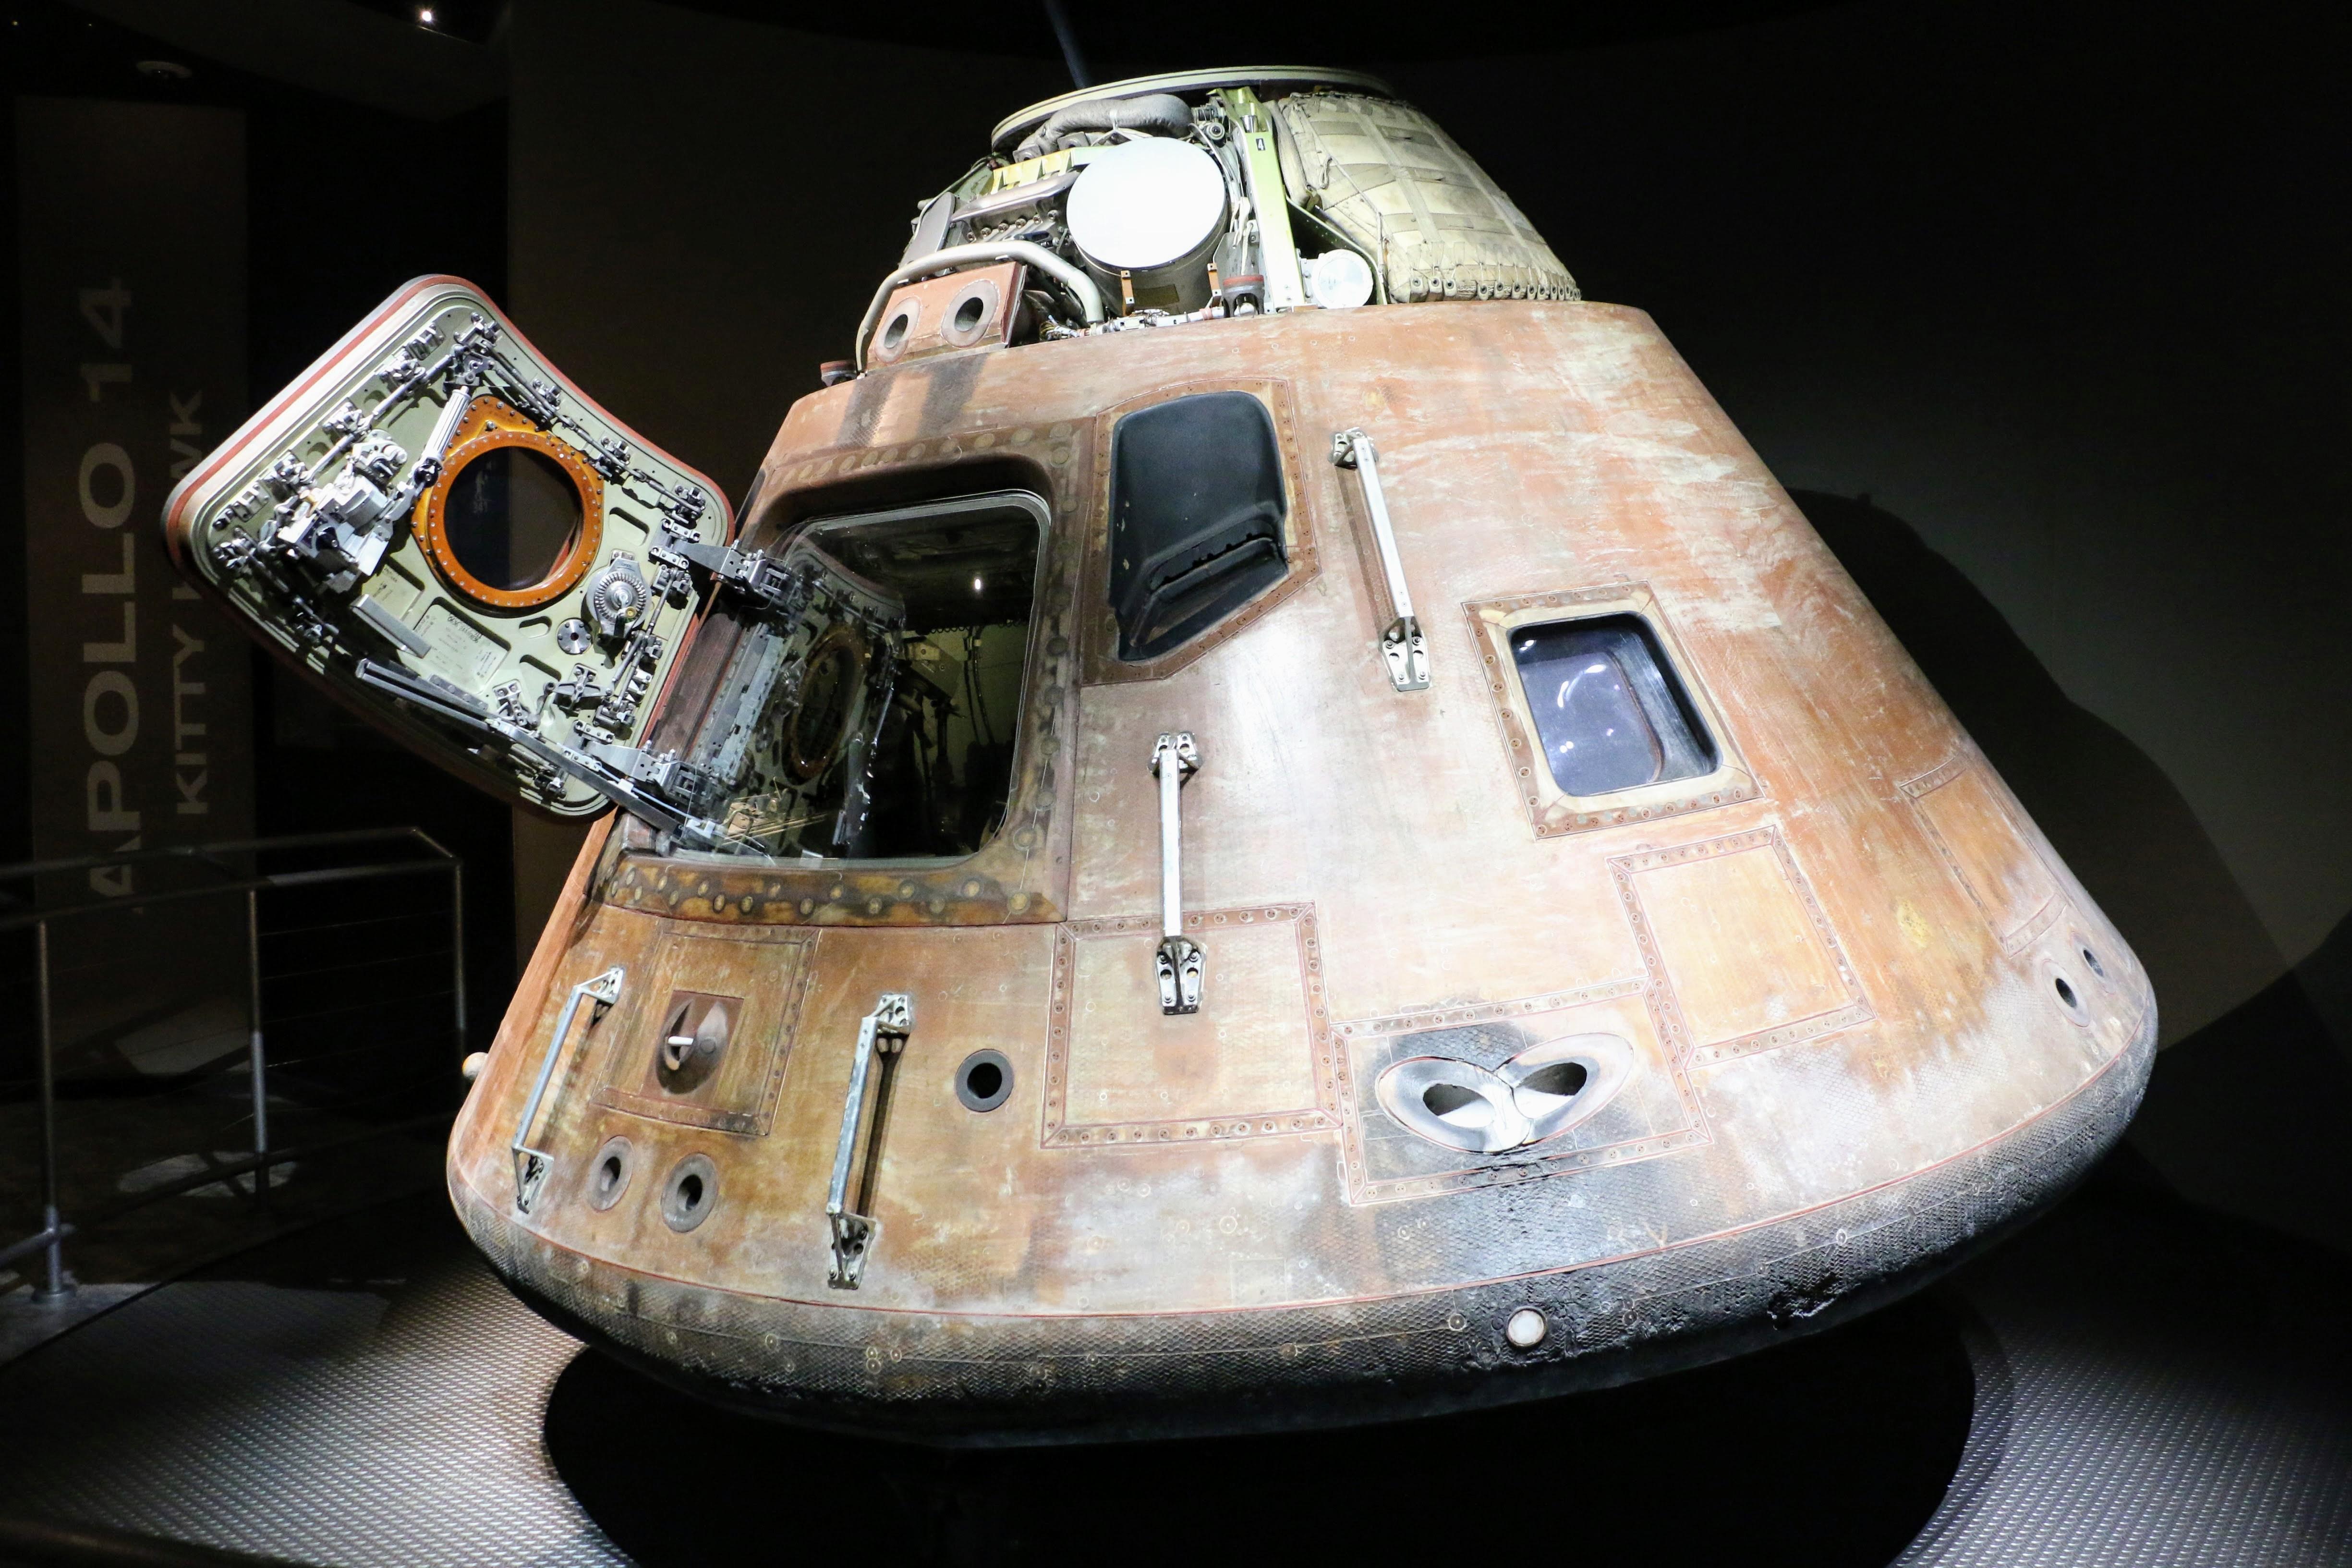 Appolo 14 in het Kennedy Space Center